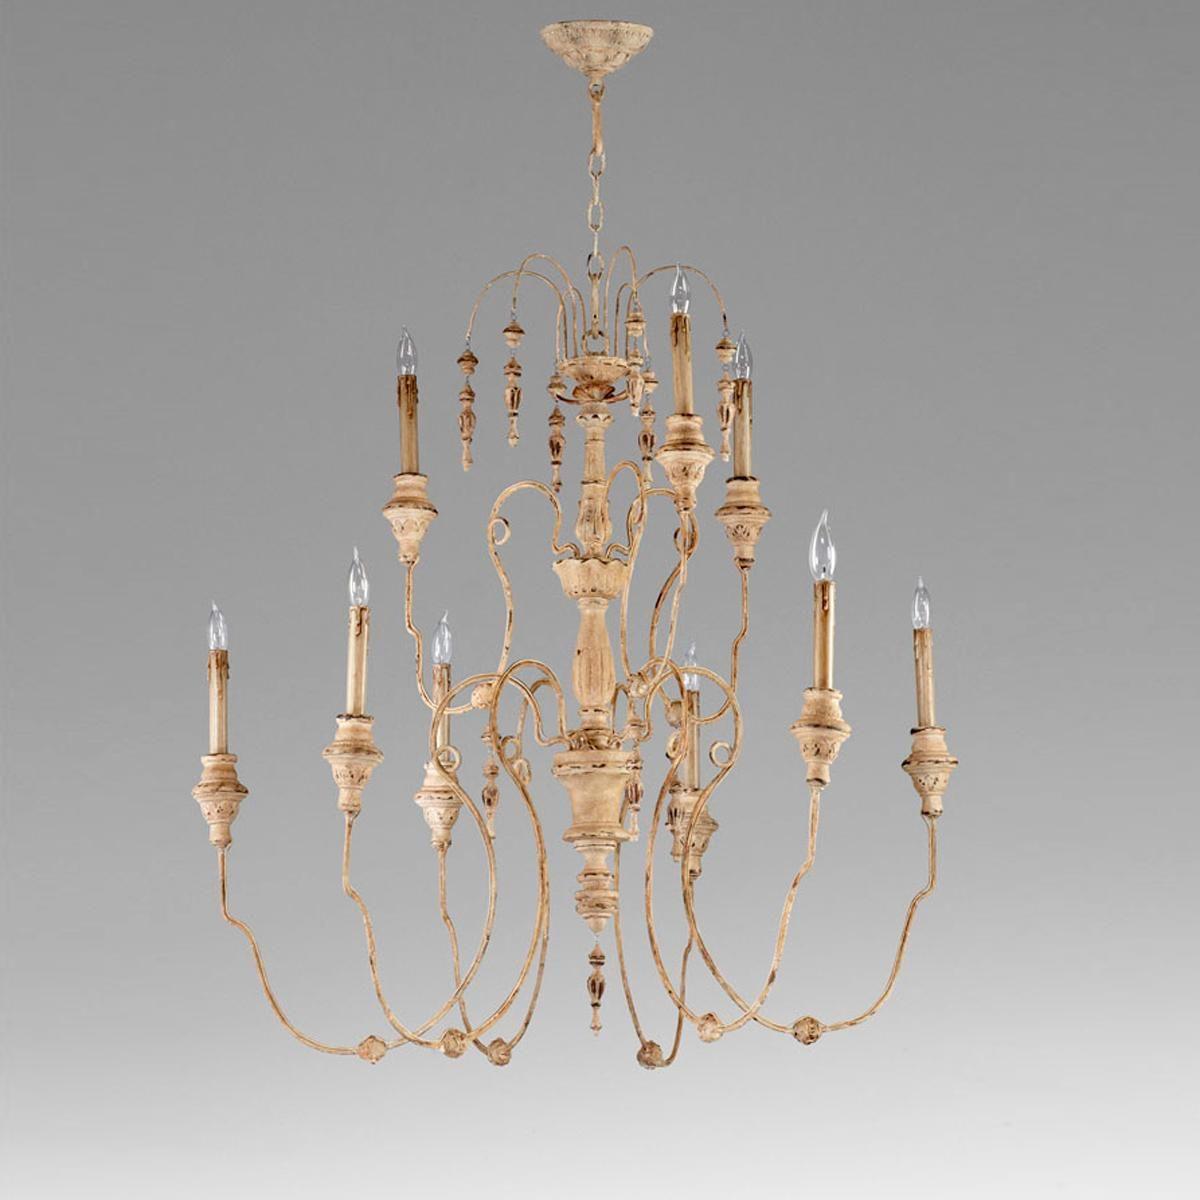 Italian Antique Reproduction Tassel Chandelier 9 lights, two tiers,  (37.5